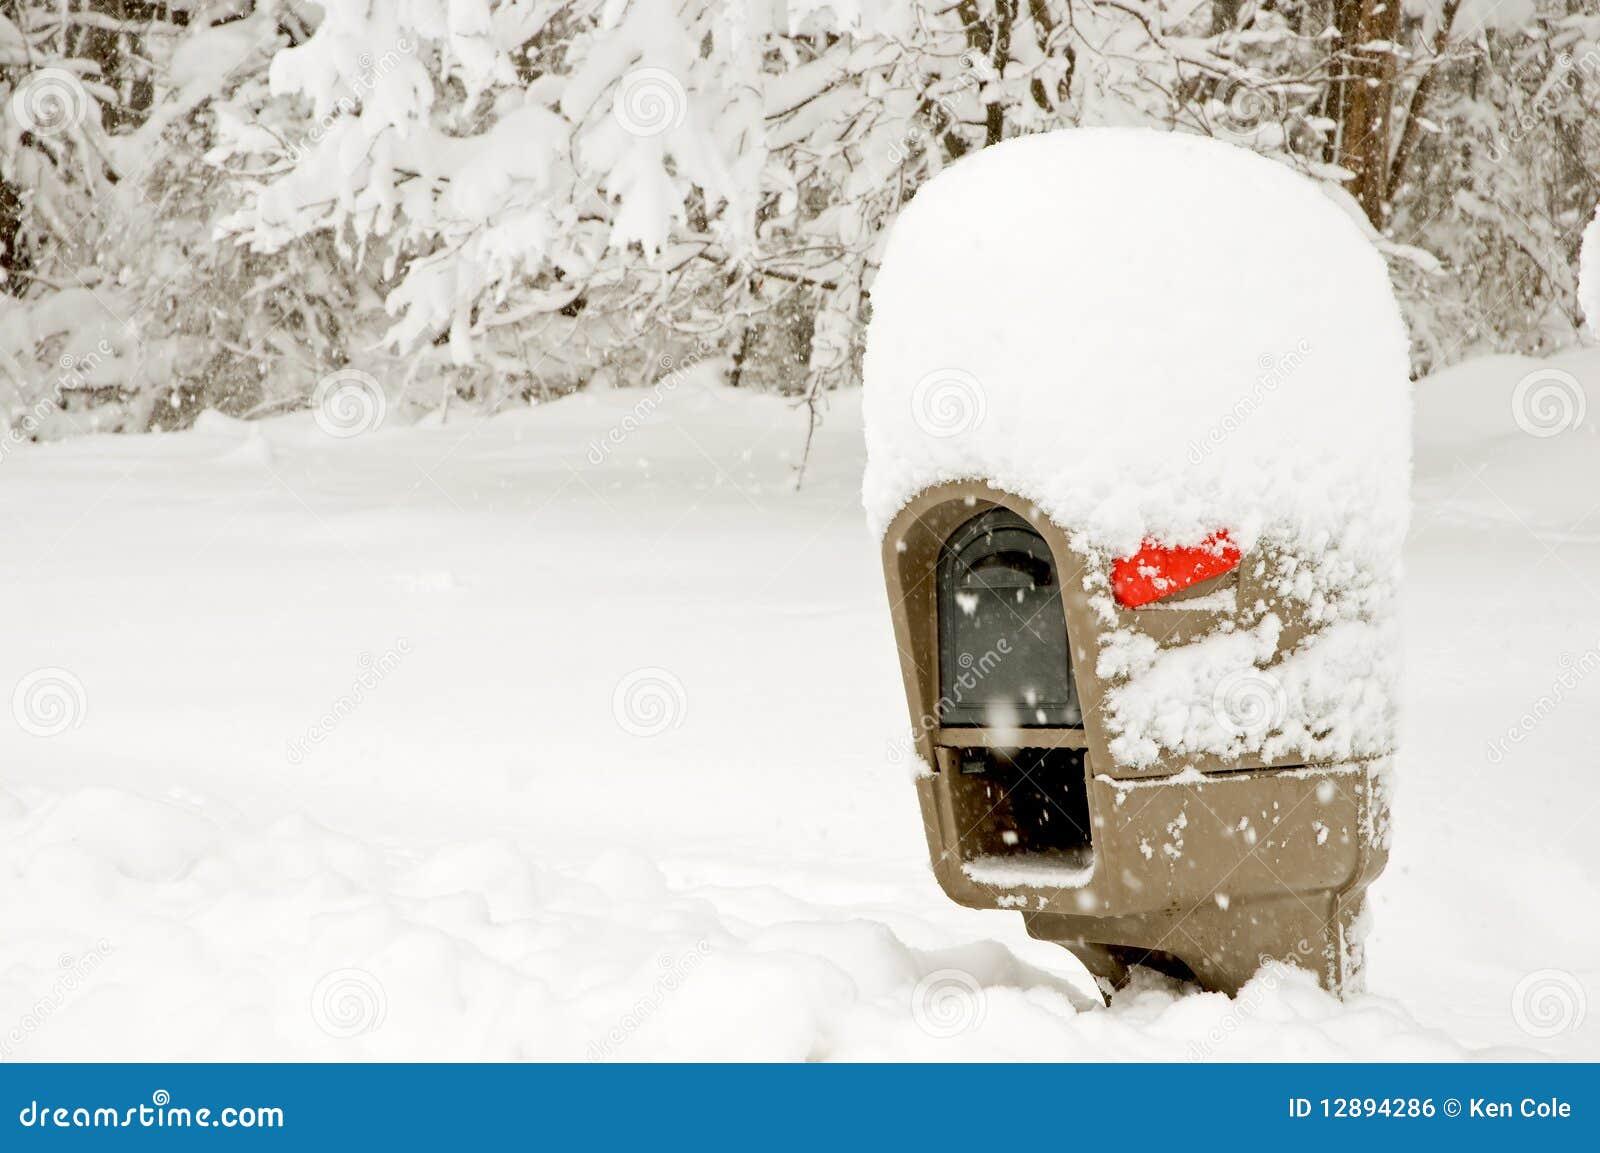 Snowy Mailbox - JPG Photos